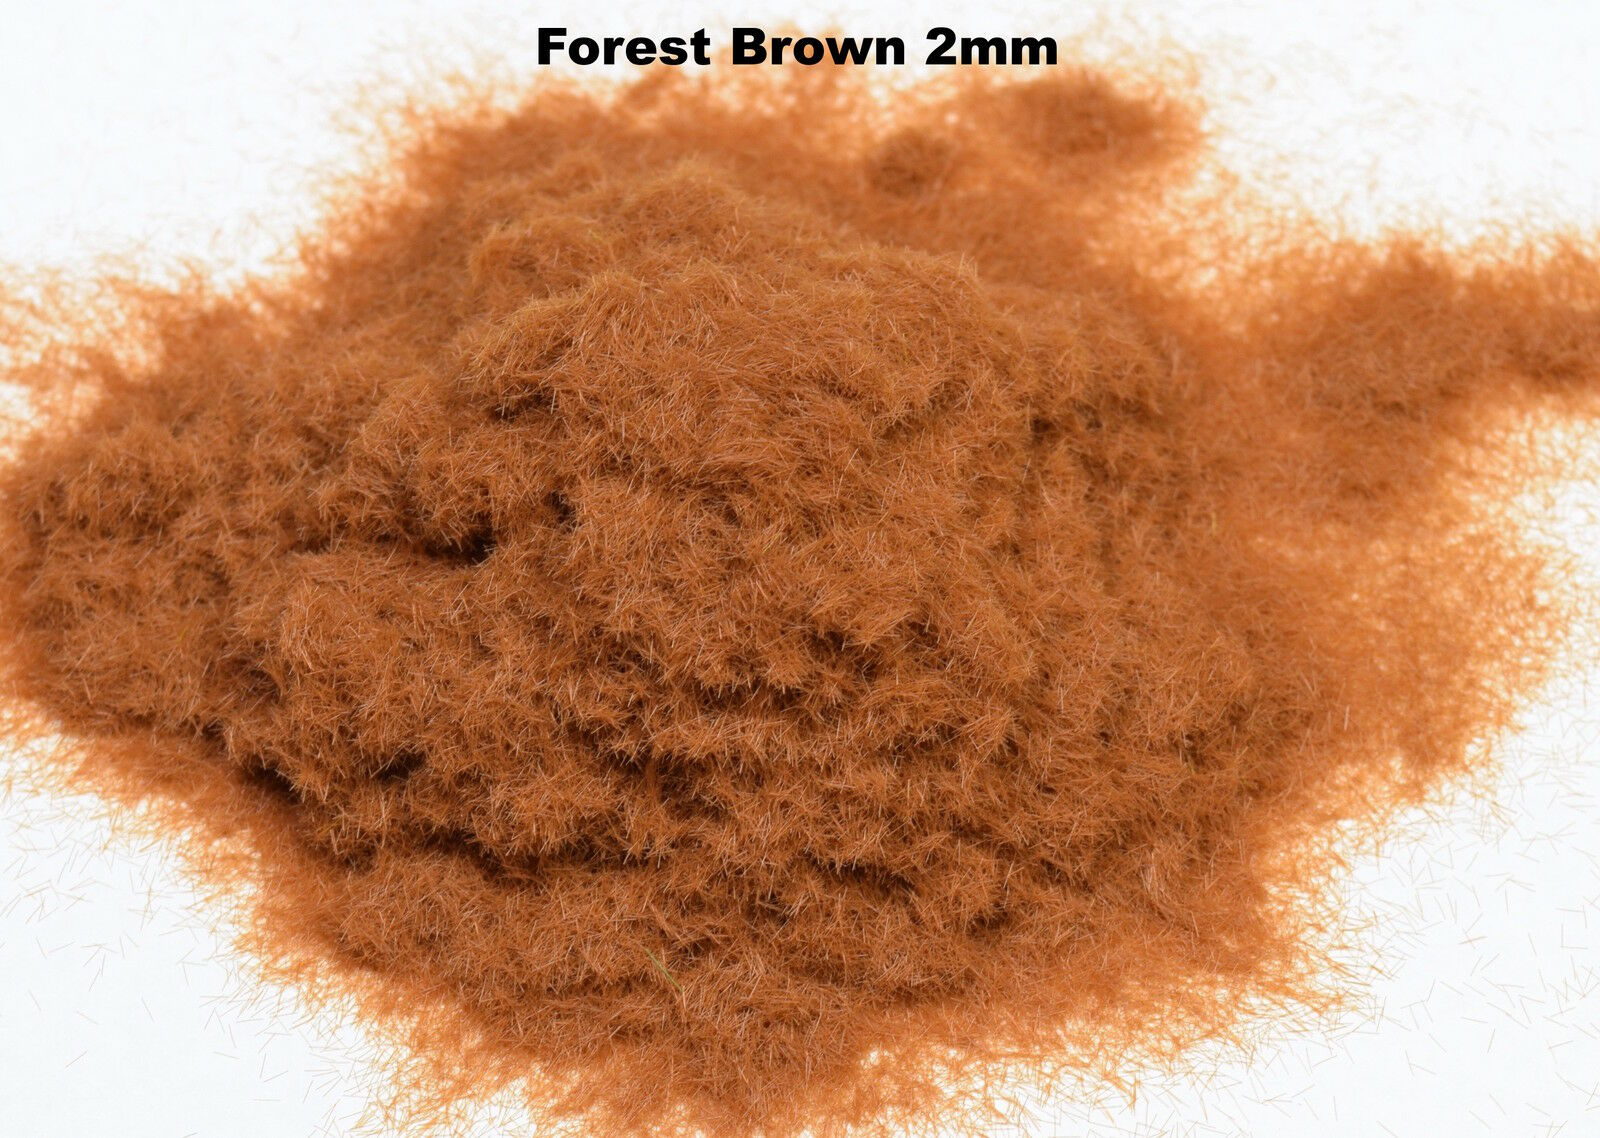 WWS 2mm marrón Static Grass Hornby Peco Railway Scenery Scenery Scenery 10, 25, 50 & 100g 71a461